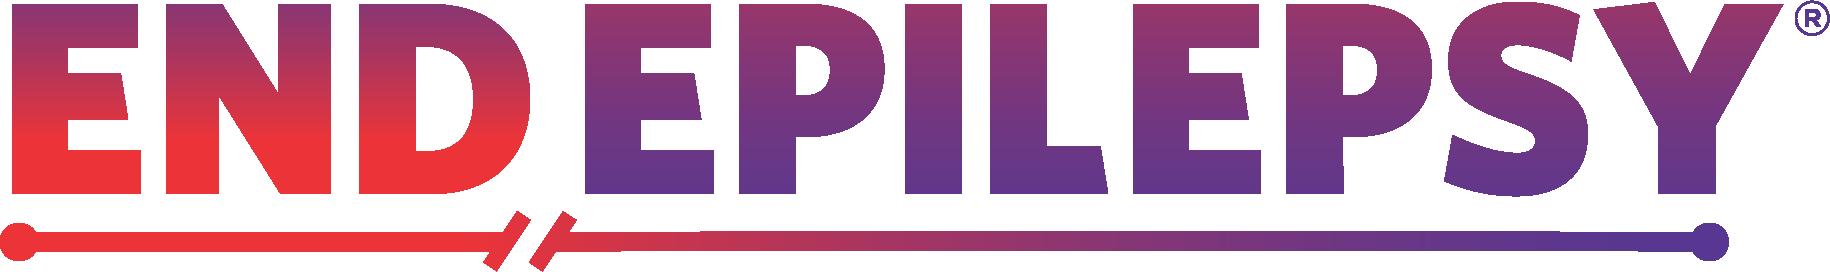 end epilepsy logo